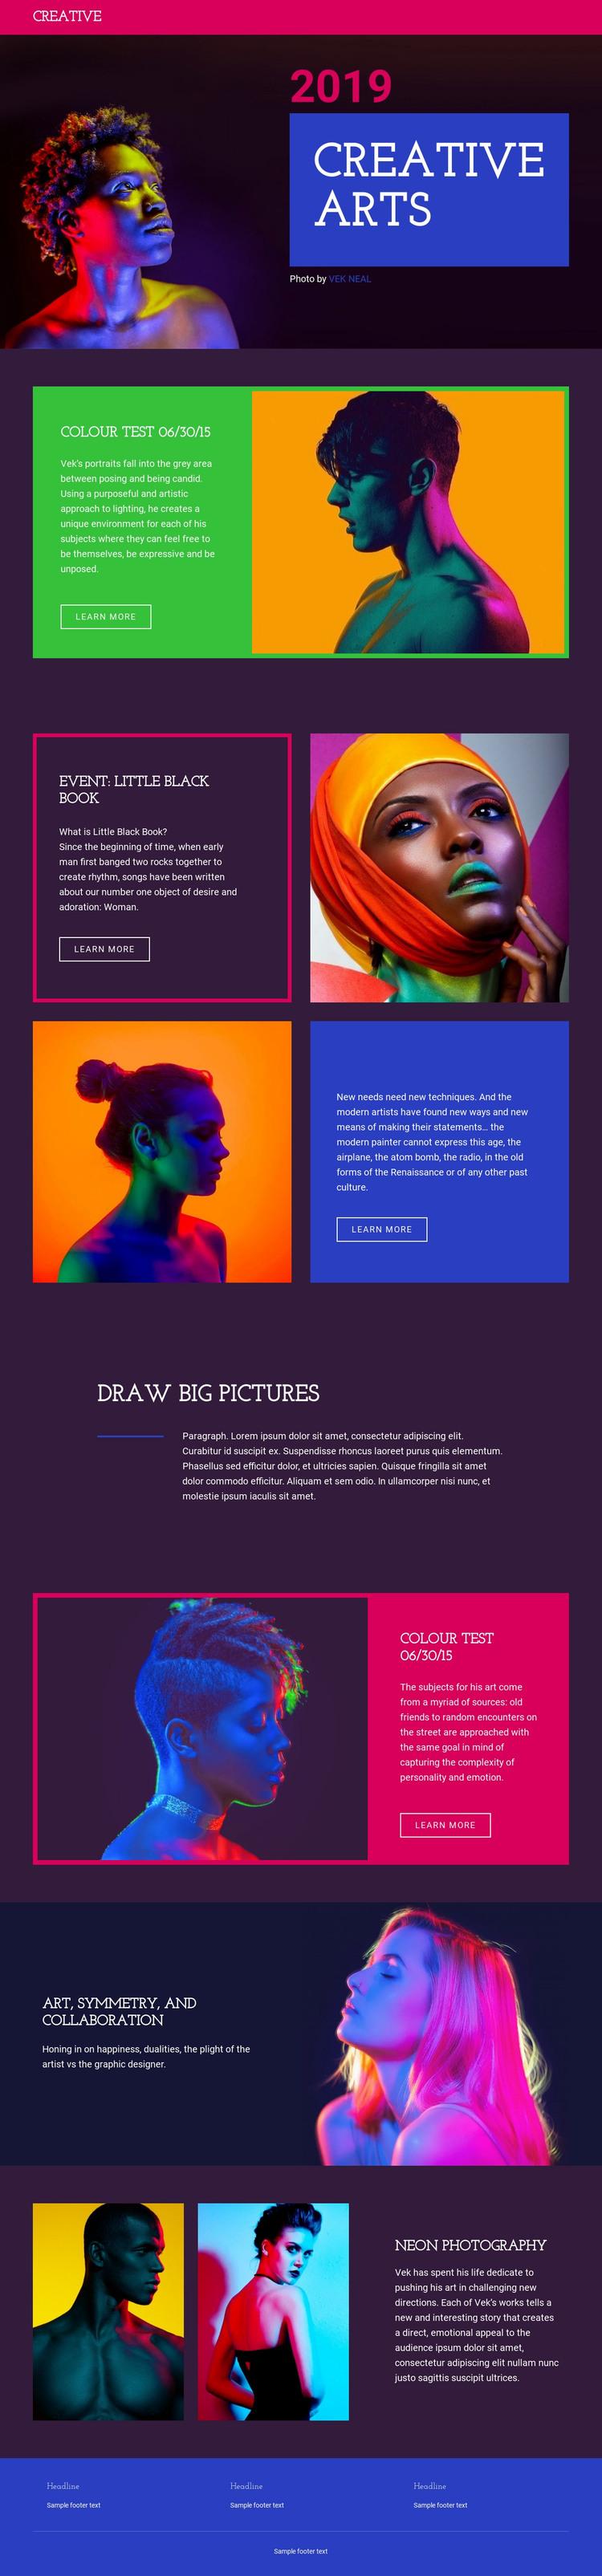 Limited-edition photography WordPress Theme